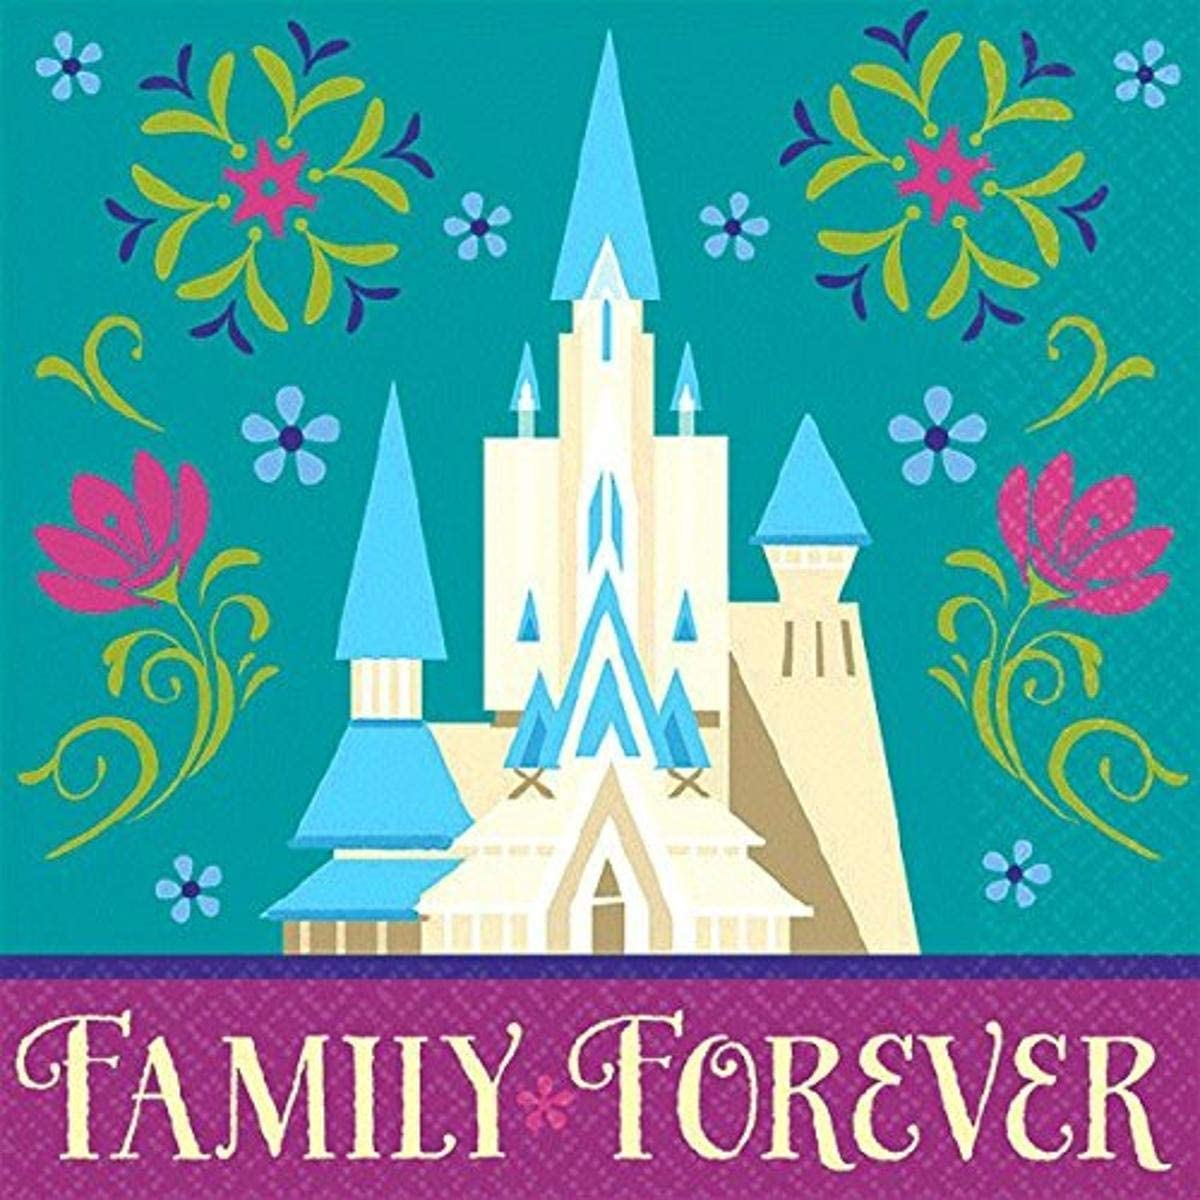 Disney Frozen Beverage Napkins Birthday Party Tableware Supply (16 Pack), Teal/Violet, 5